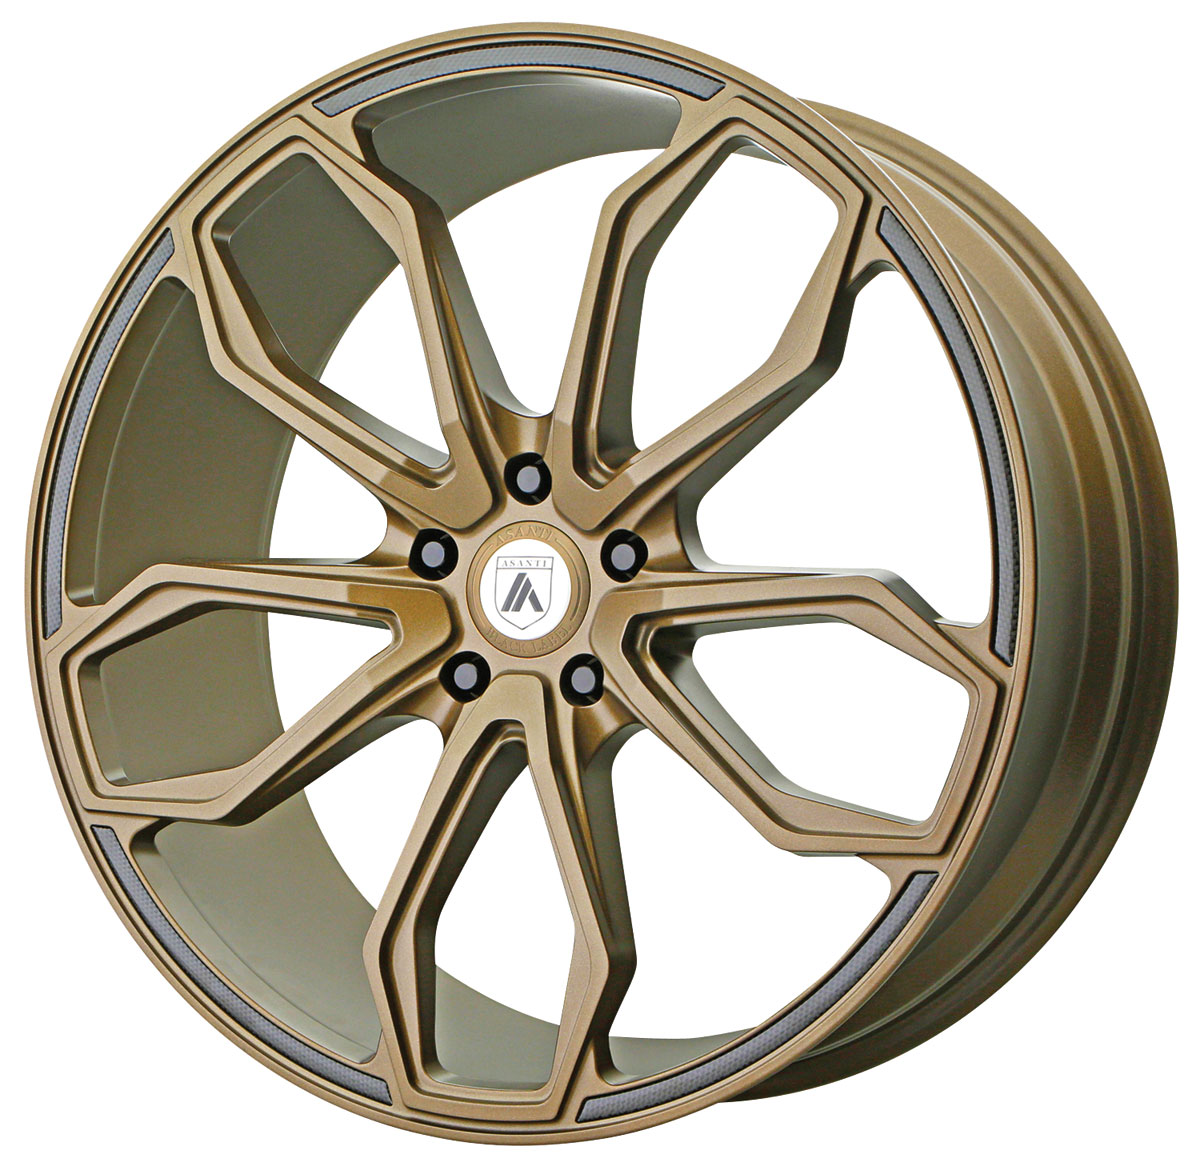 Wheel, Asanti Black, ATHENA, 2016-19 CTS/CTS-V, 22x9